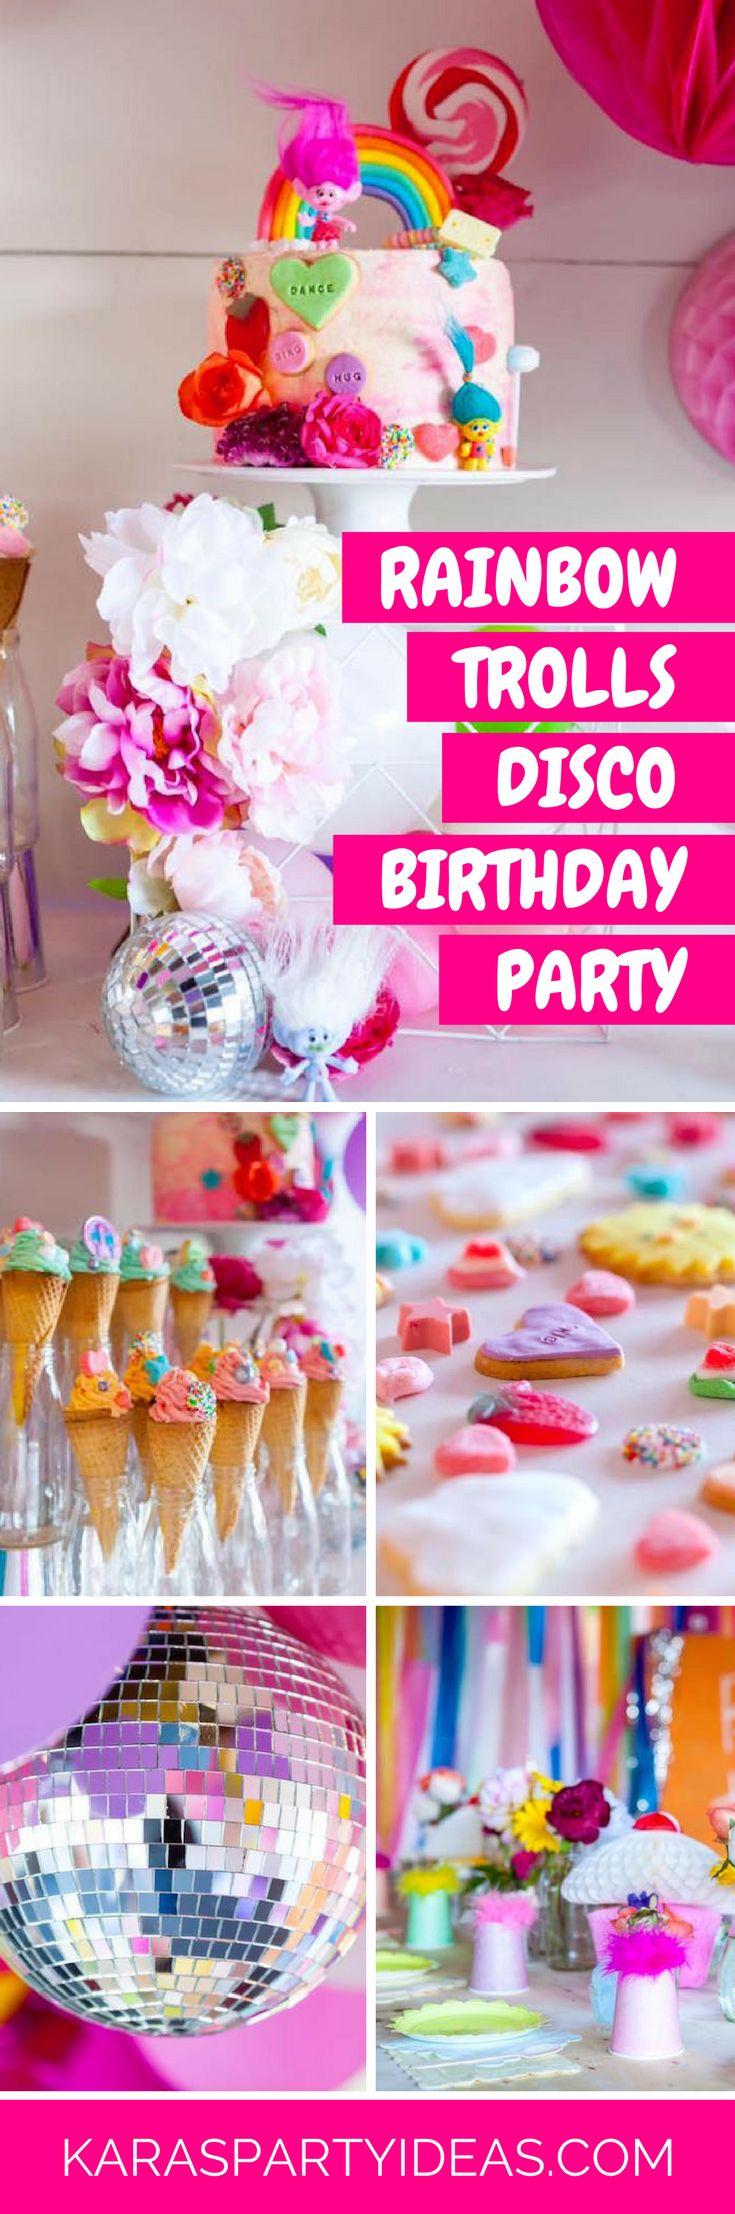 From kara s party ideas rustic dessert table display designed by - Rainbow Trolls Disco Birthday Party Via Kara S Party Ideas Karaspartyideas Com